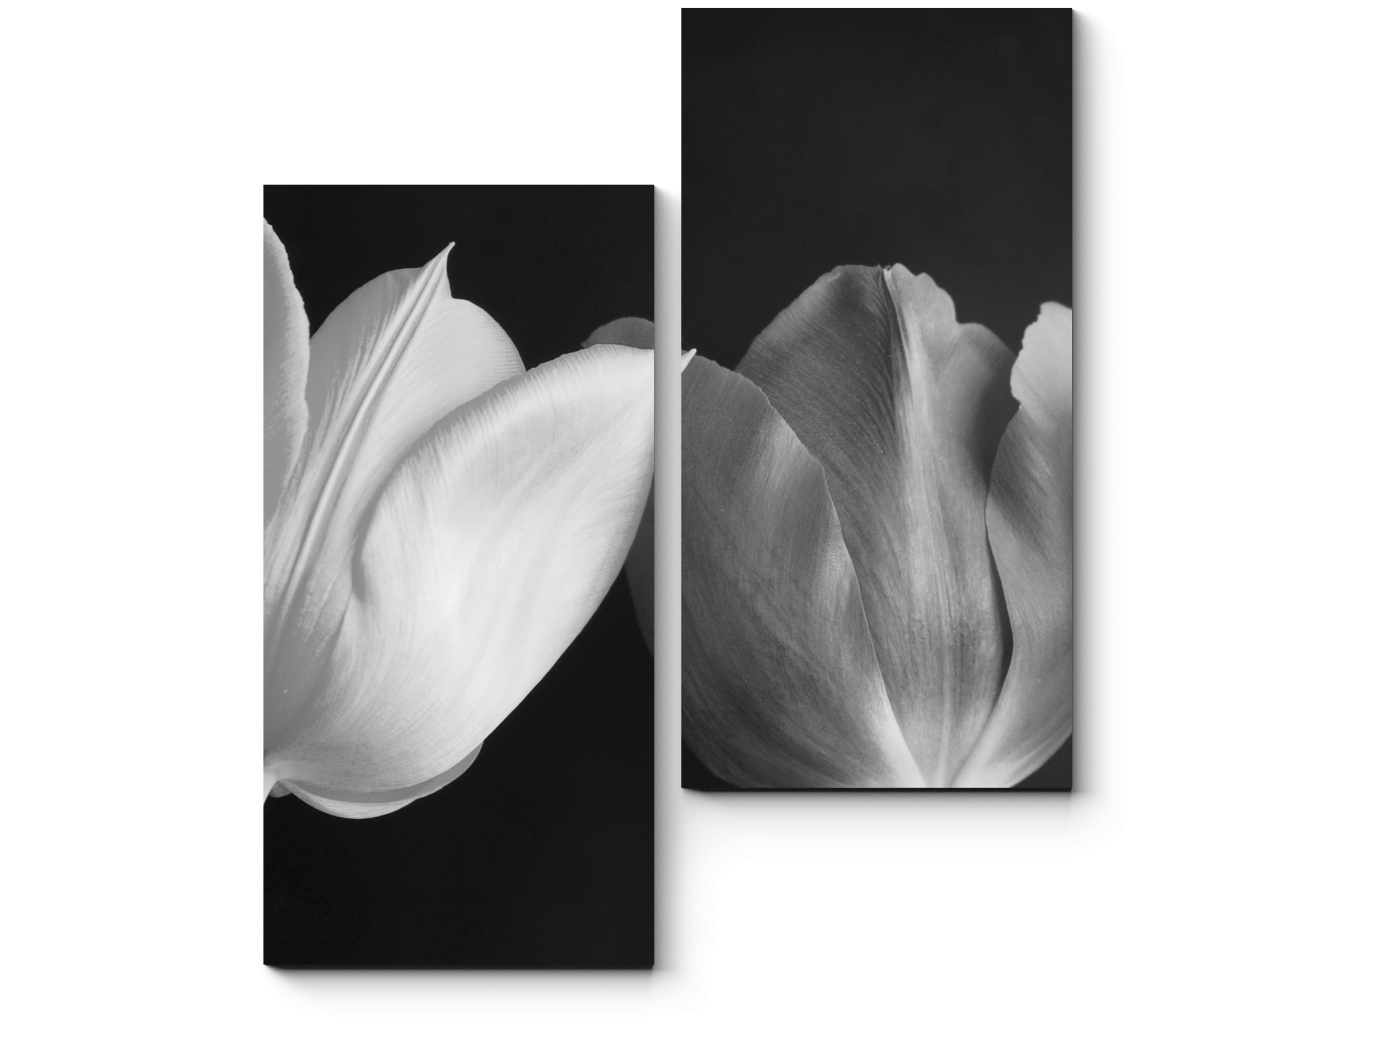 Модульная картина Монохромные тюльпаны (40x50) фото